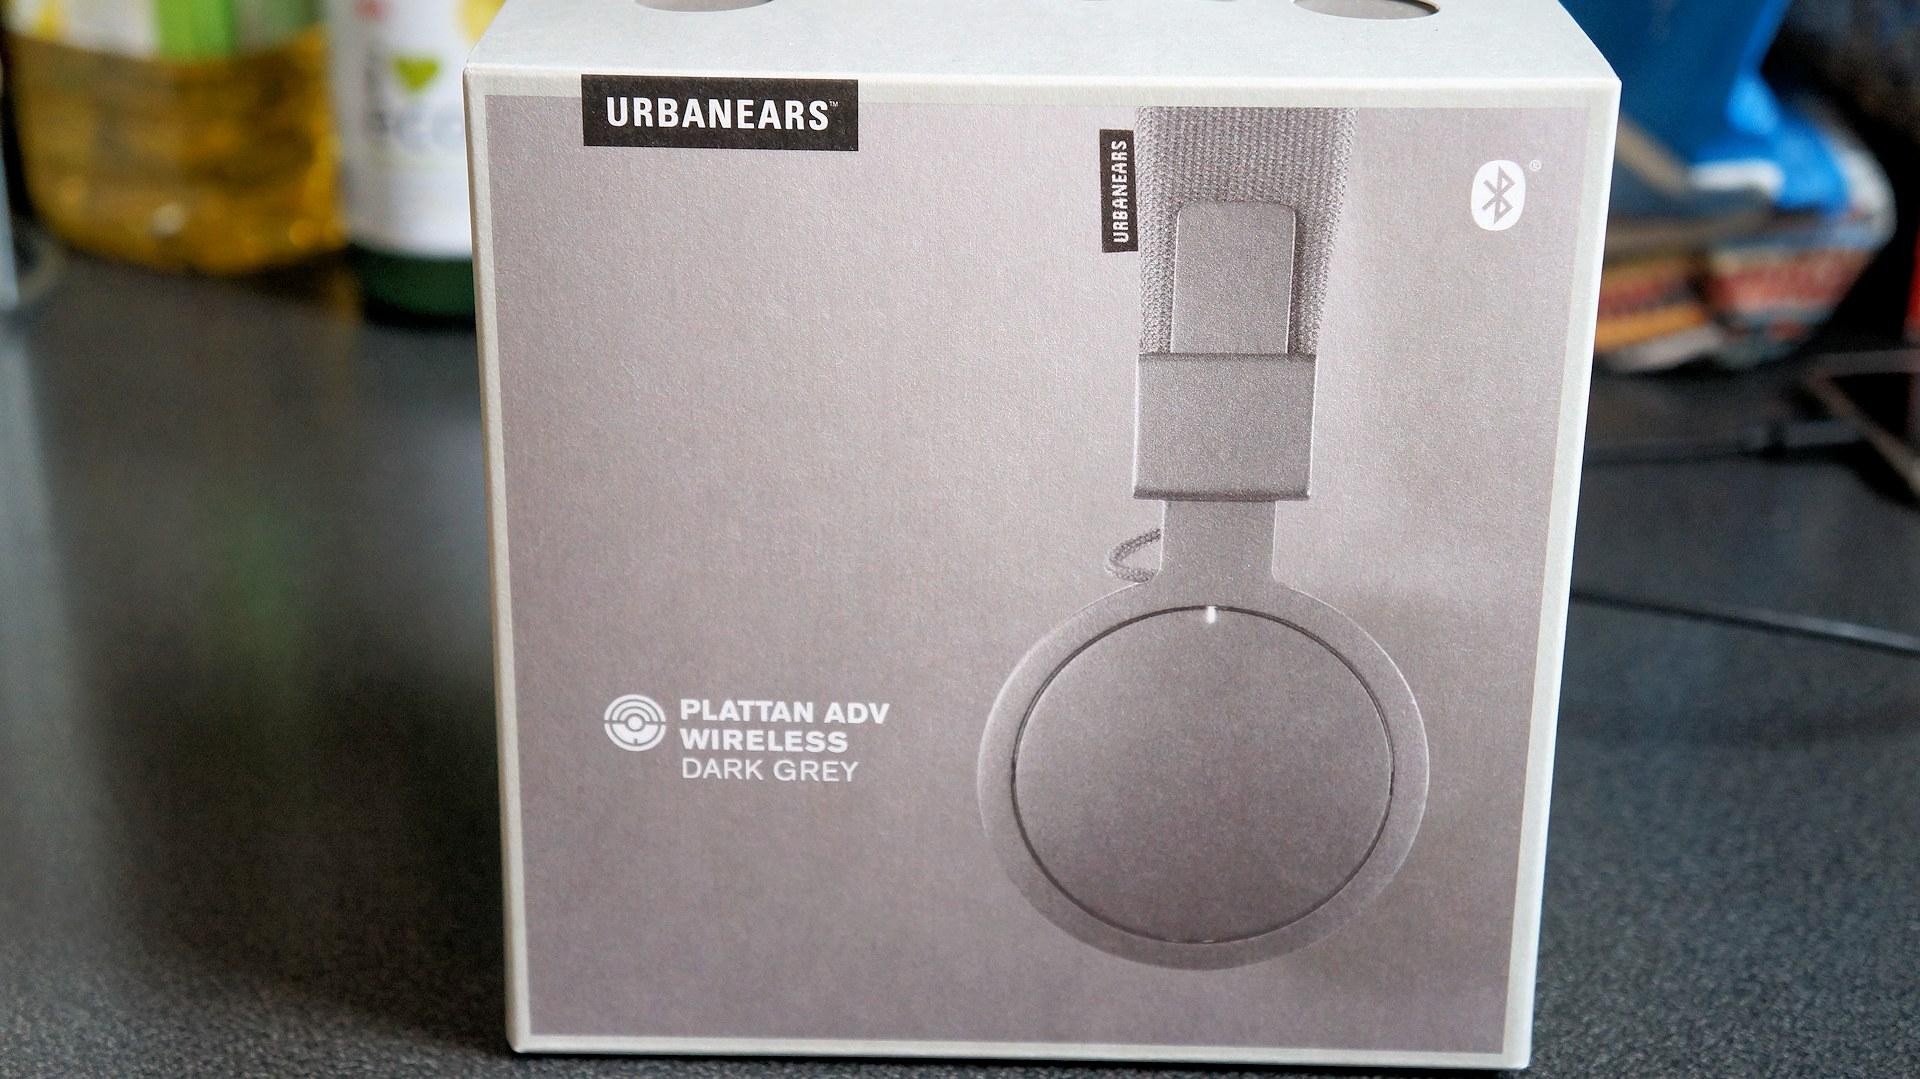 Test av trådlösa Bluetooth-hörlurarna Urbanears Plattan ADV Wireless ... 57e0ad2caa34a